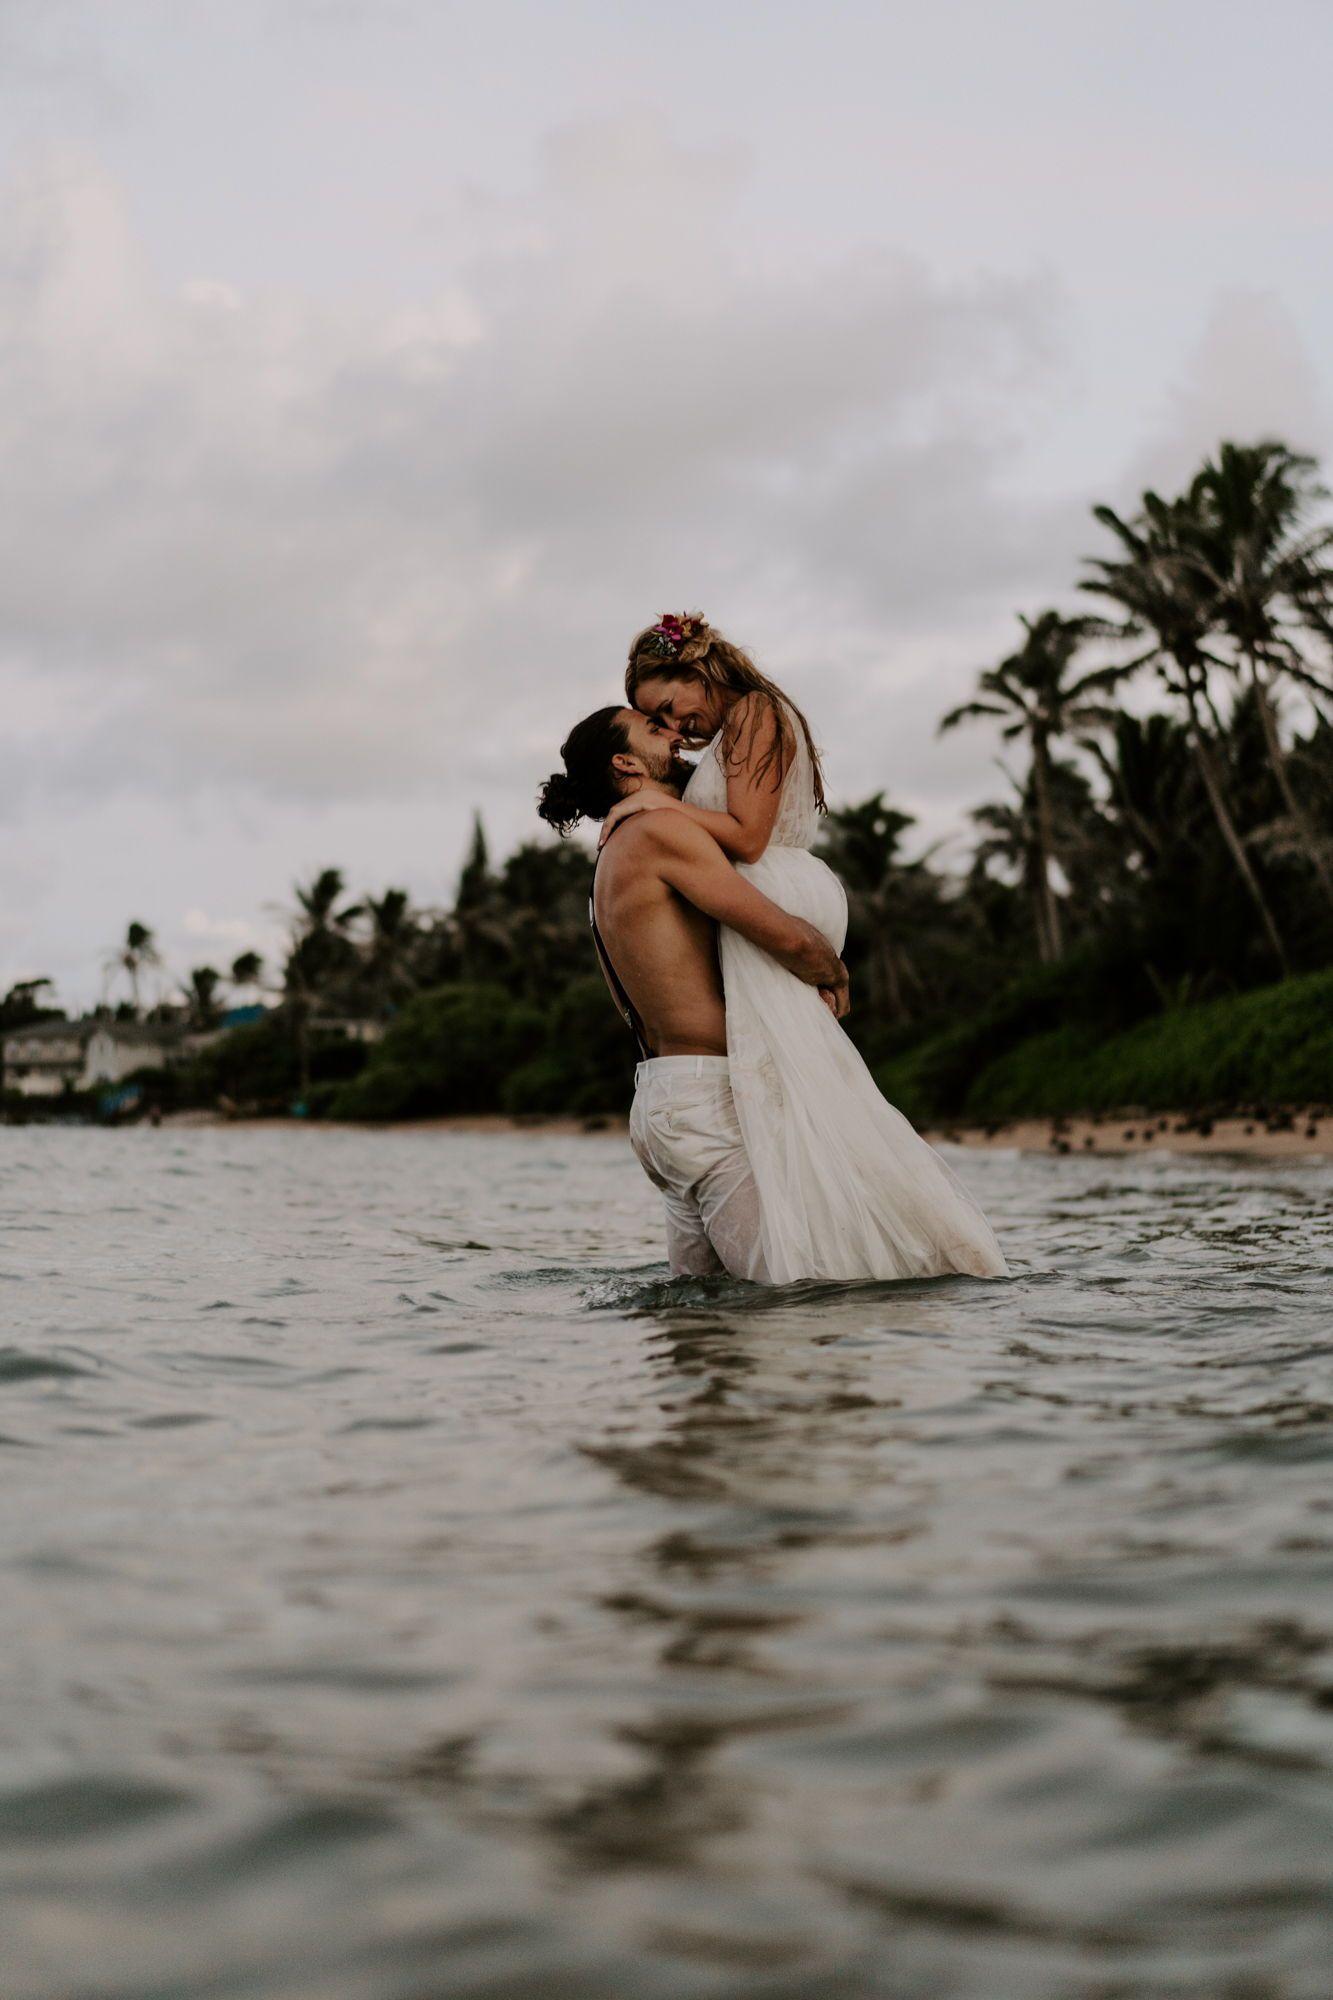 How To Plan Your Trash The Dress Session In Hawaii Aloha Zoe Photography Beach Wedding Pics Elope Wedding Beach Wedding Photography [ 2000 x 1333 Pixel ]